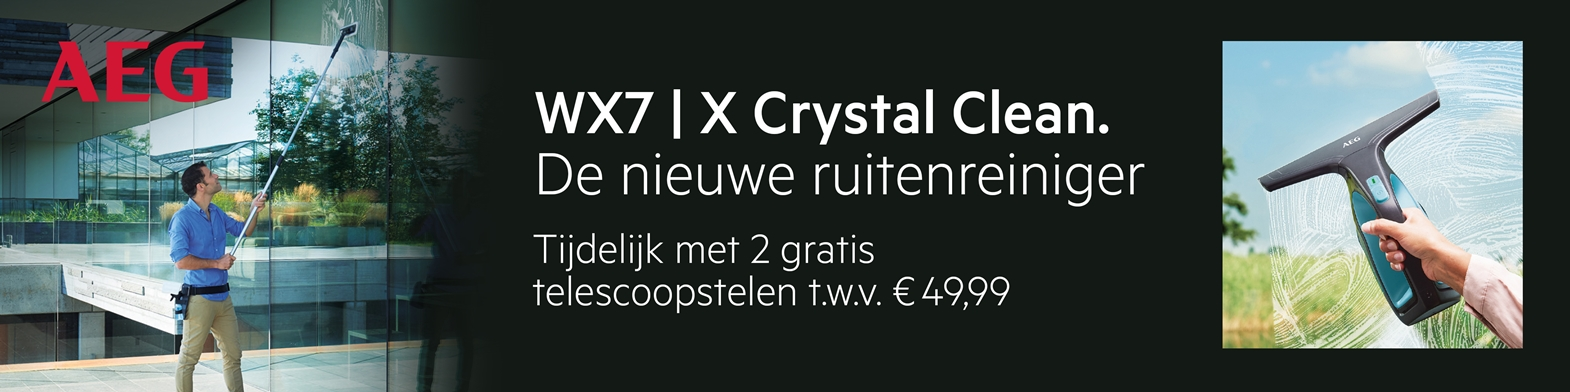 Gratis 2 telescoopstelen t.w.v. 49,99 euro   AEG WX7 ruitenreiniger   EP.nl